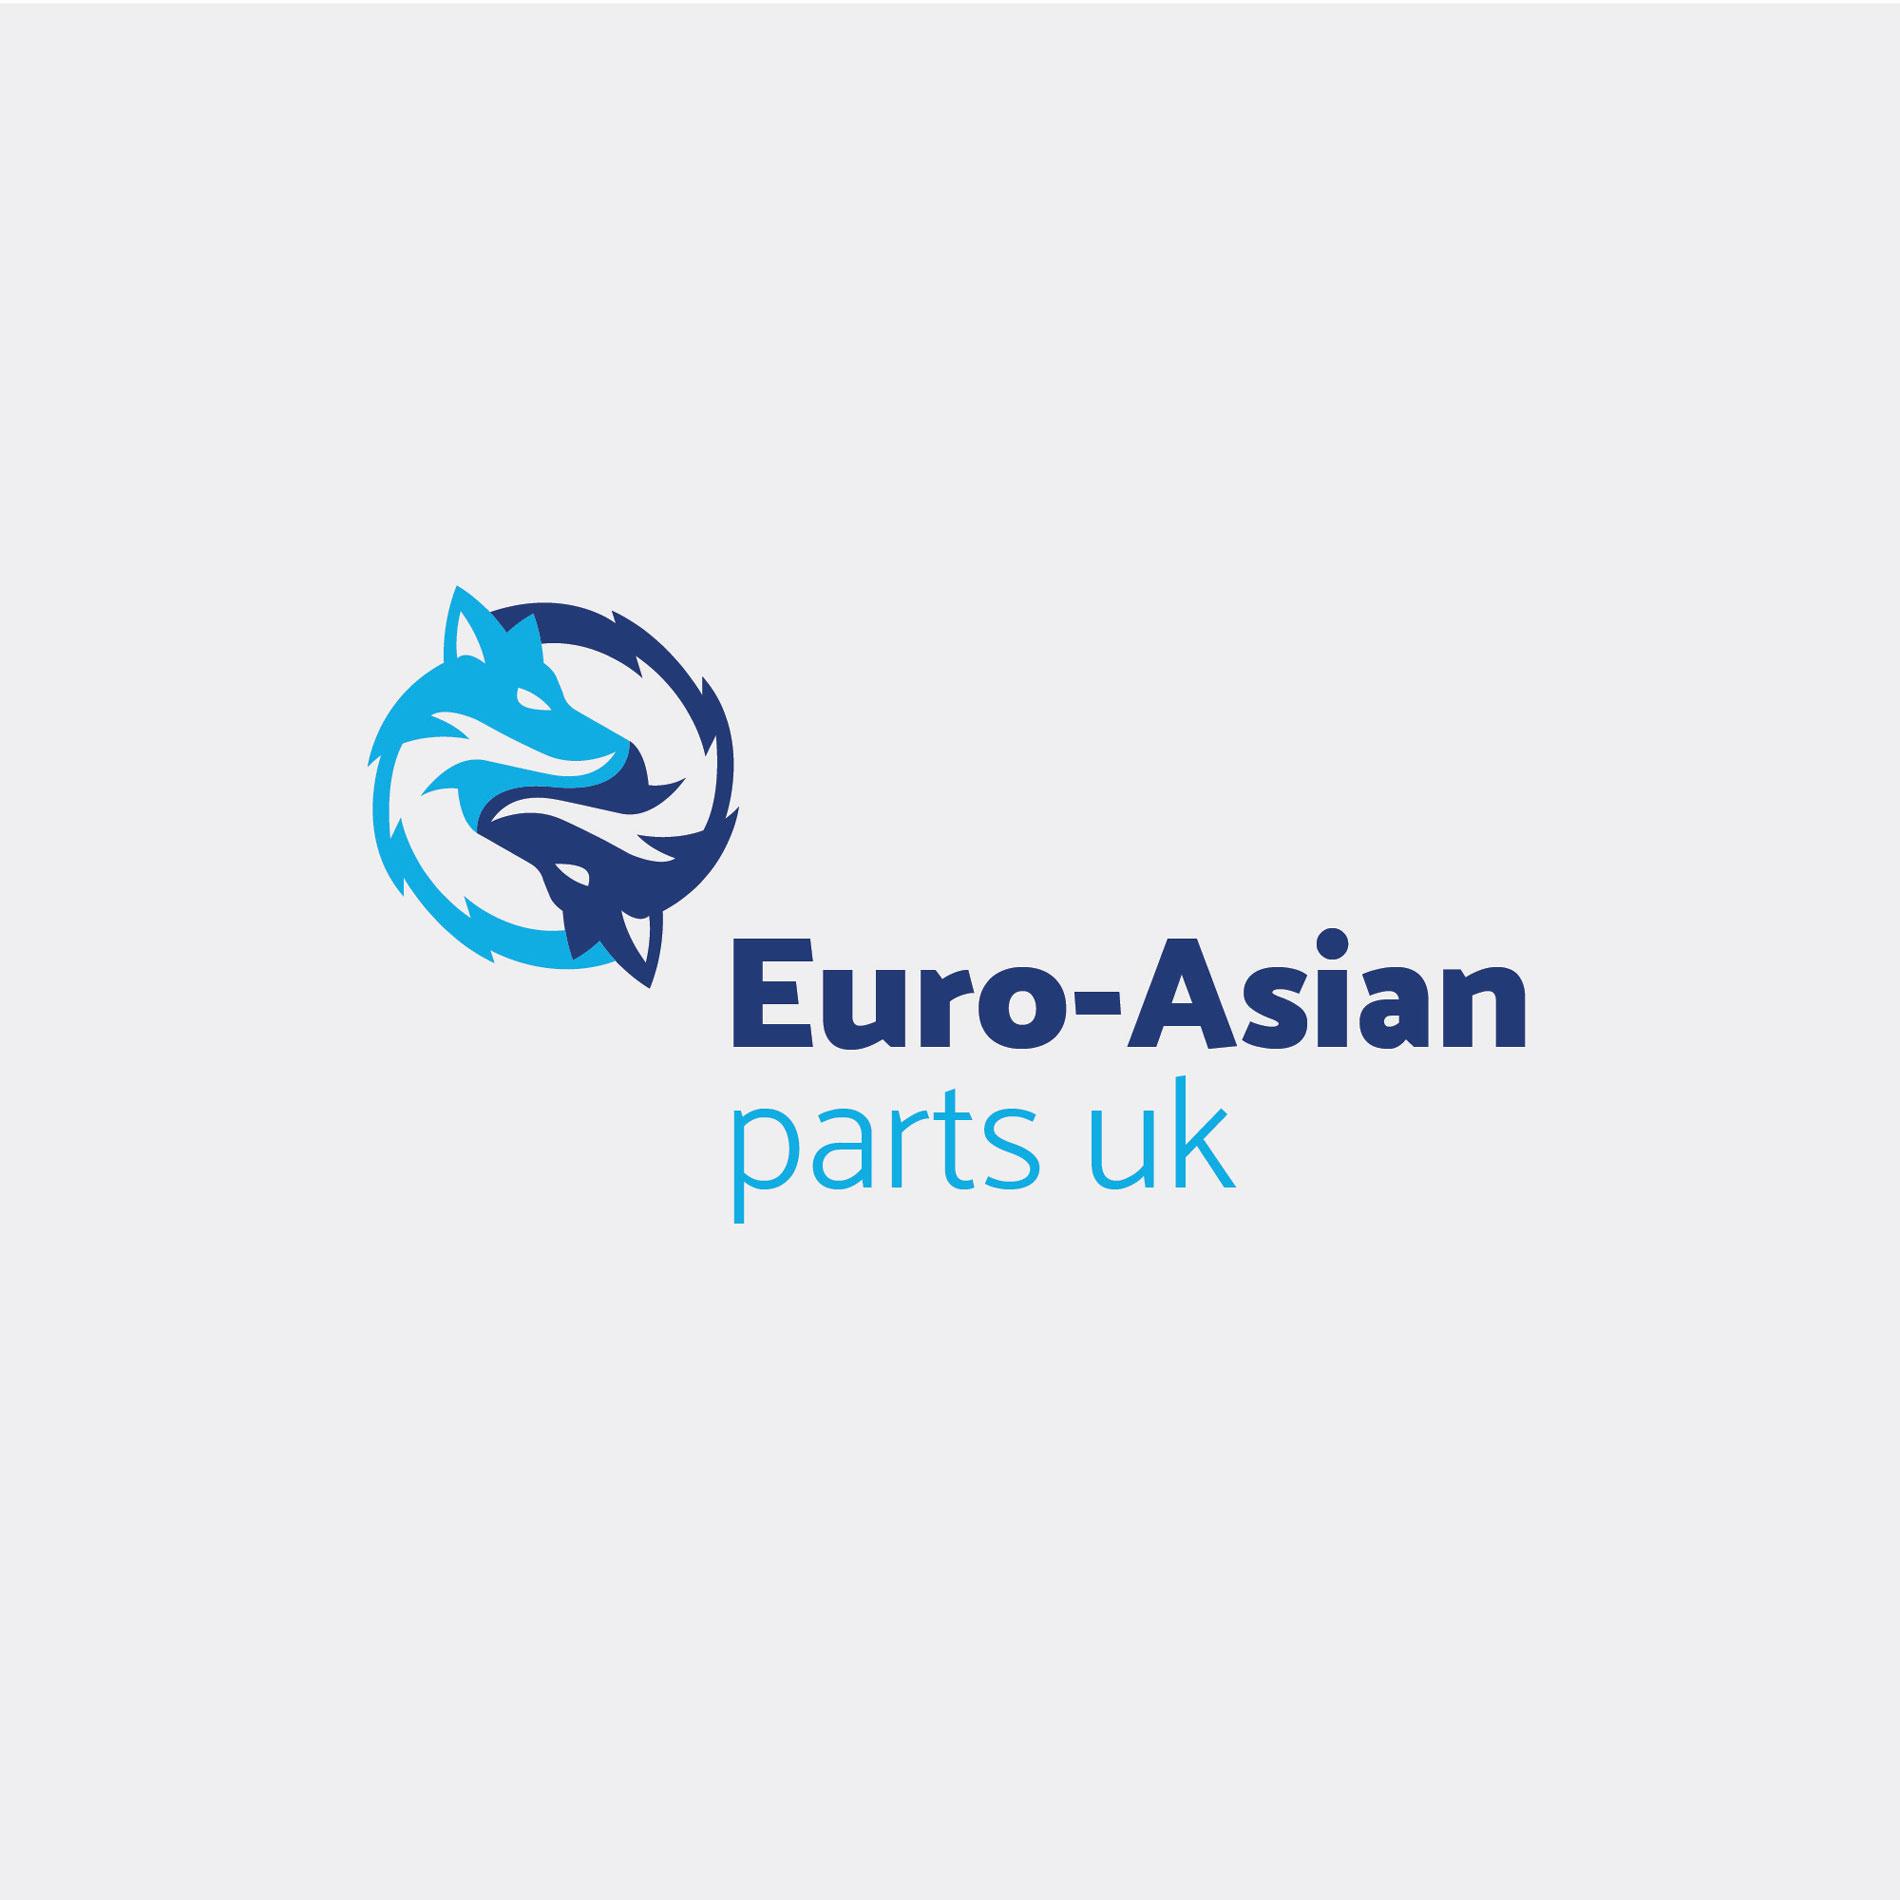 https://sconcept.be/wp-content/uploads/2021/01/euro-asian-parts-2.jpg